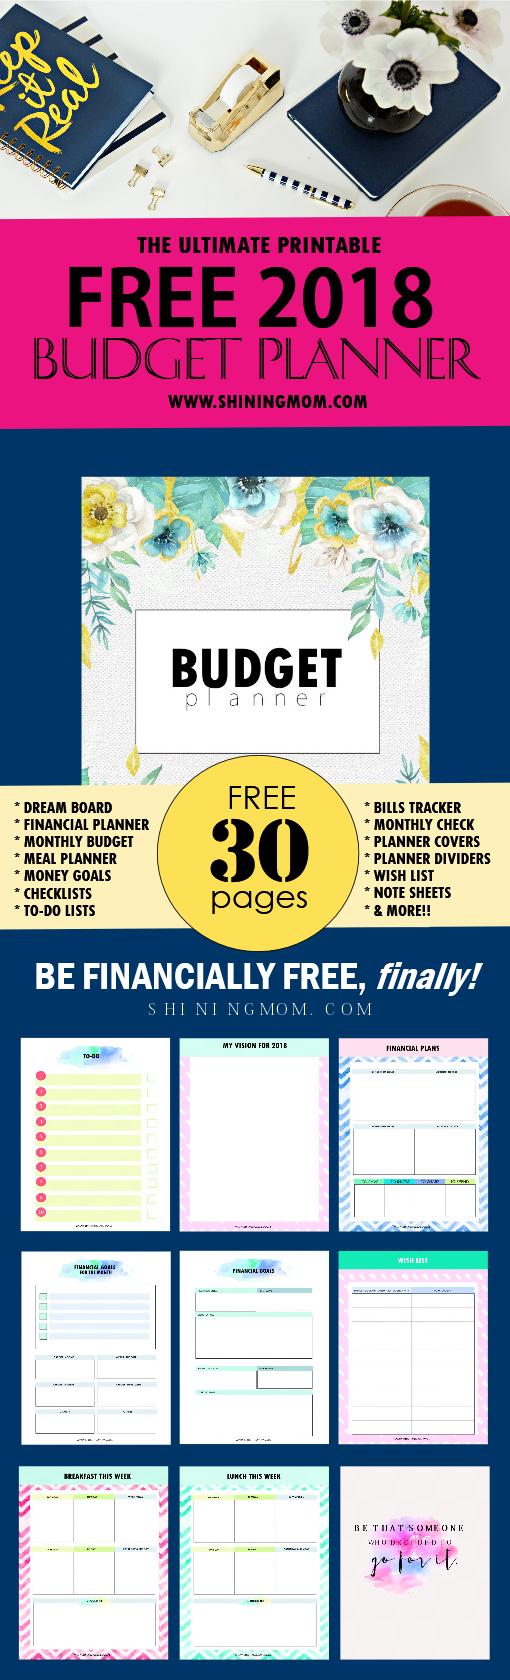 The Ultimate Free Printable 2018 Budget Planner You Need! - Budget Binder Printables 2018 Free